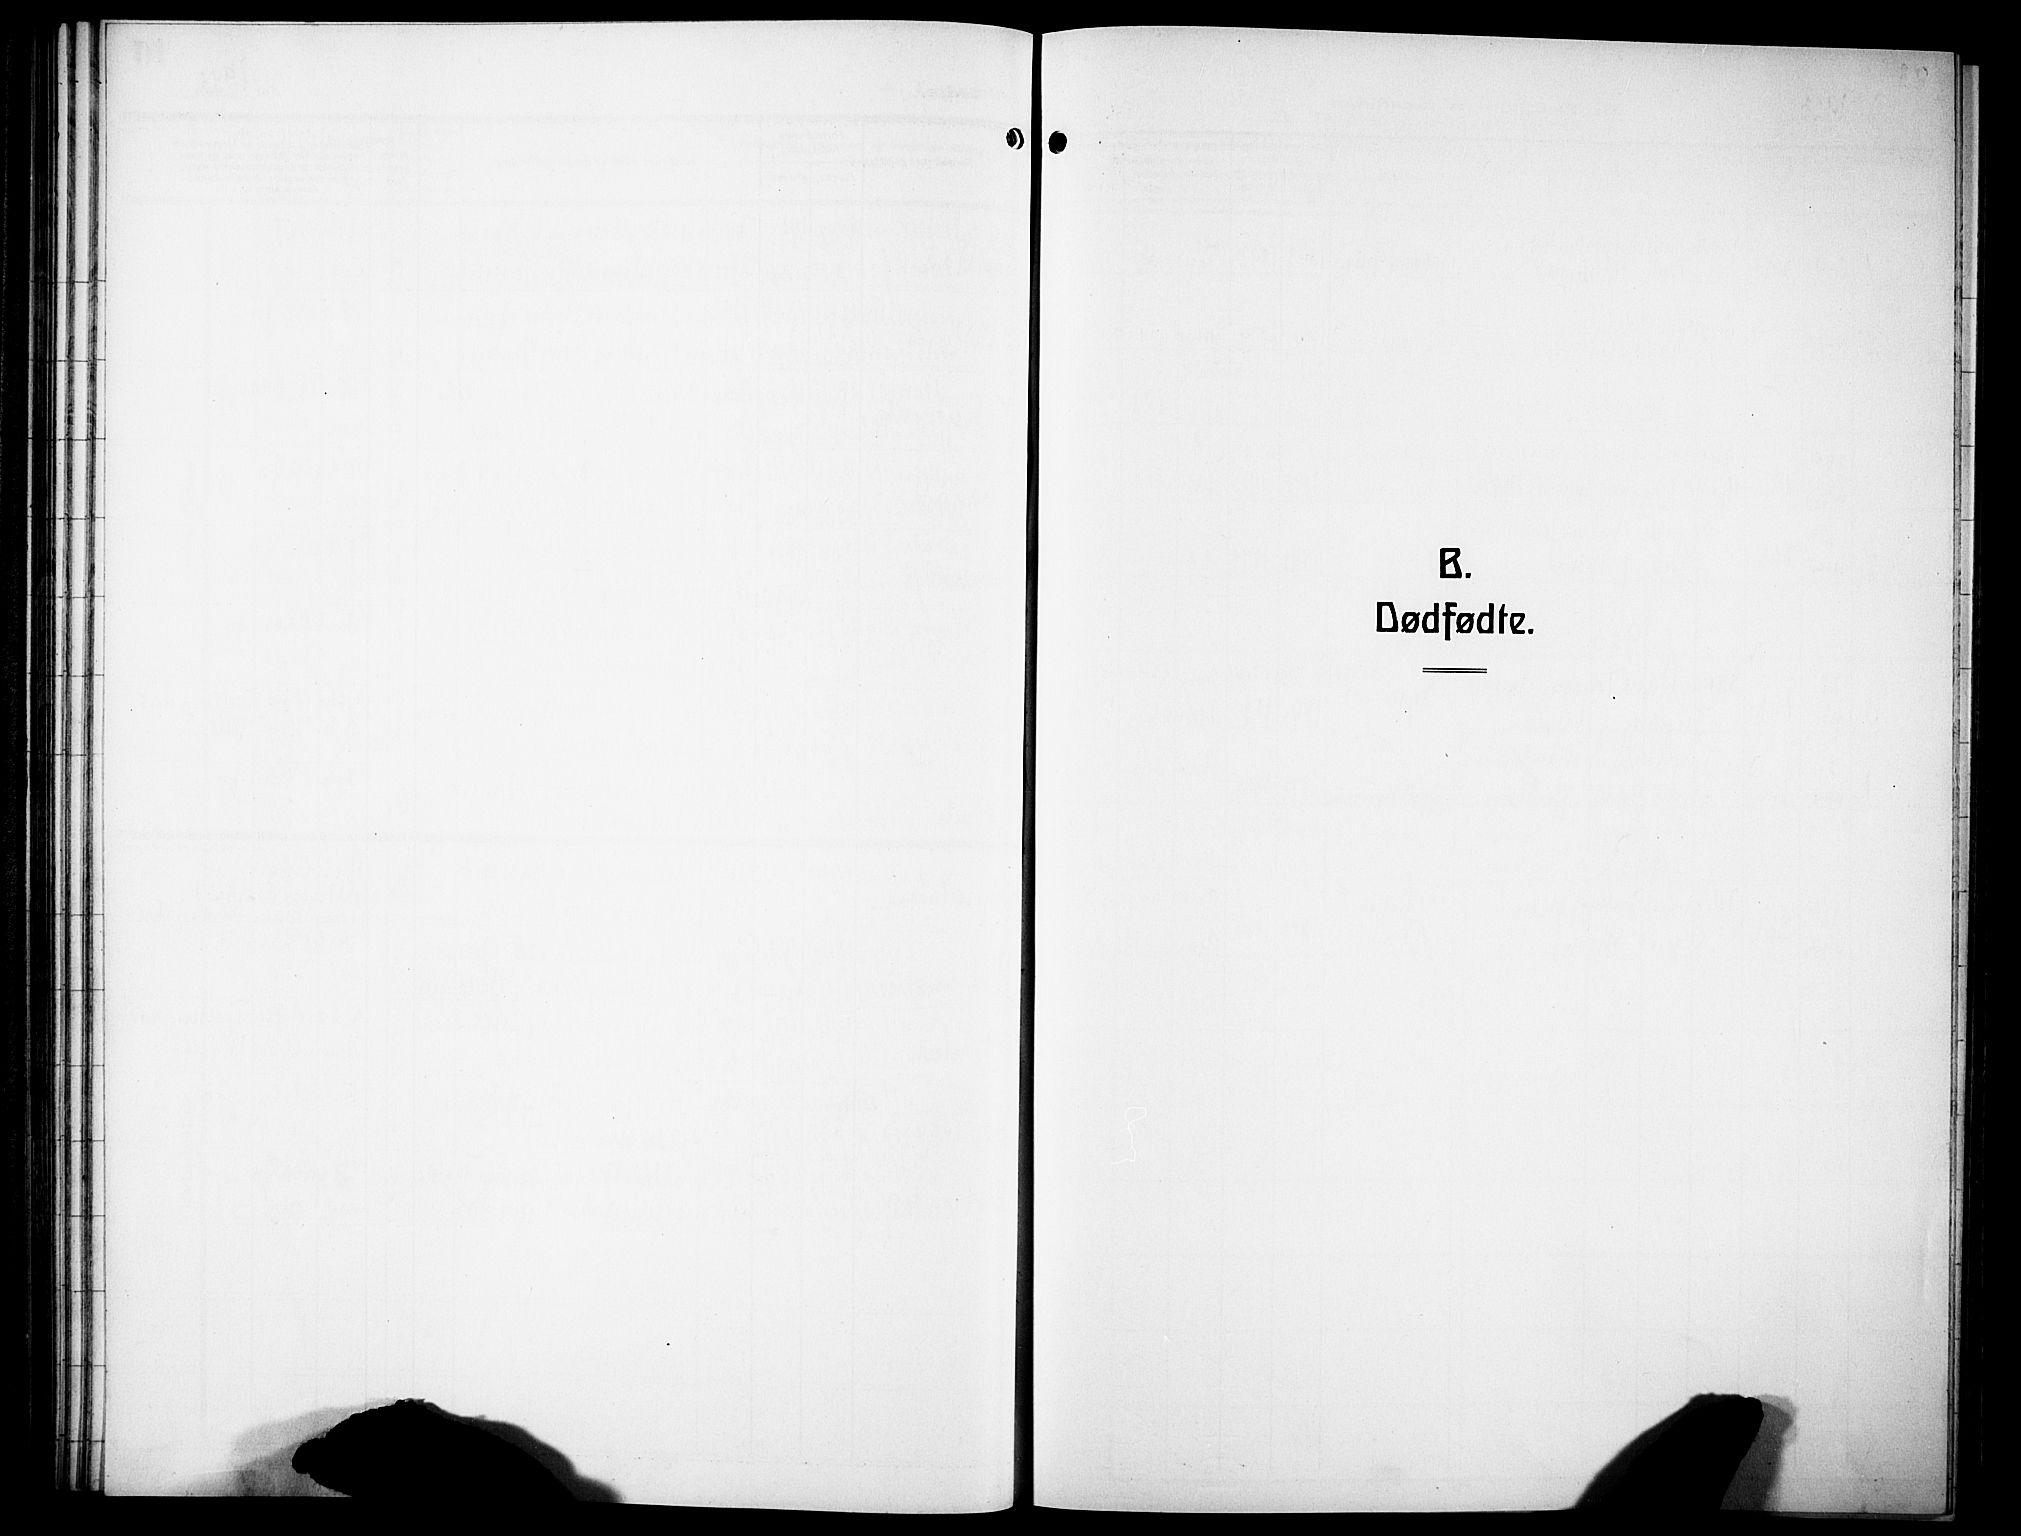 SAH, Lunner prestekontor, H/Ha/Hab/L0002: Klokkerbok nr. 2, 1923-1933